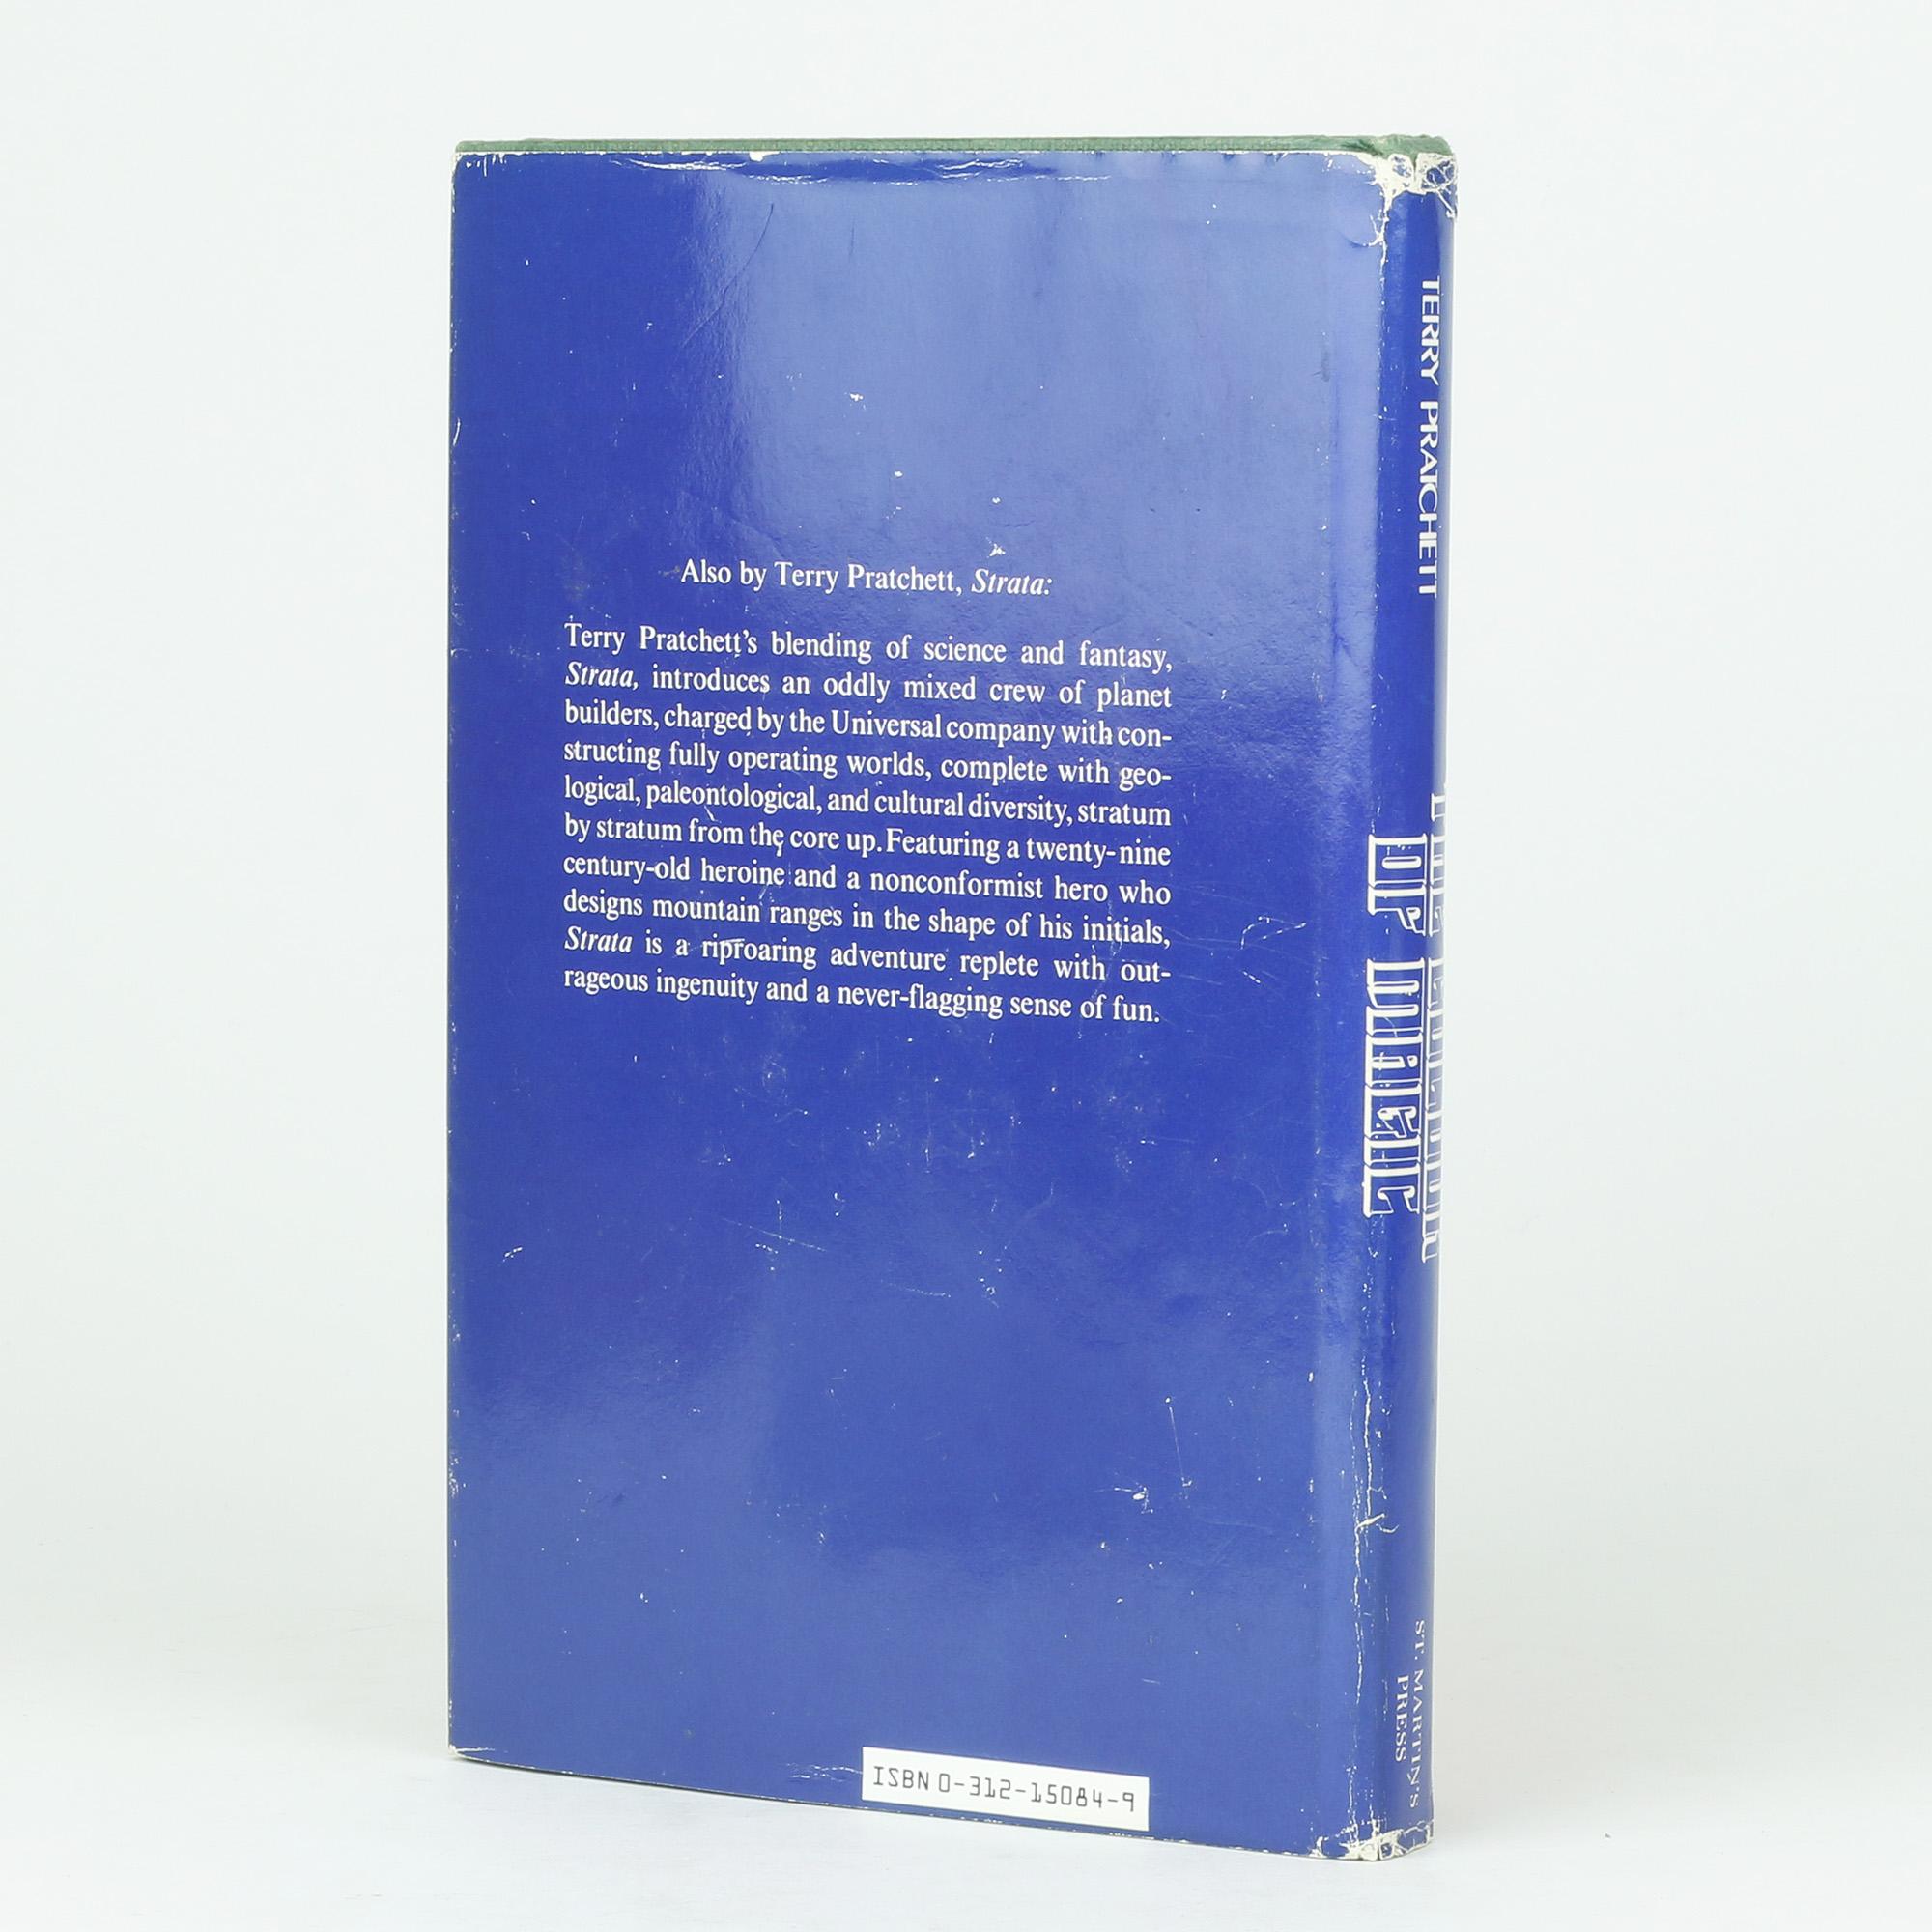 Colour book of pratchett magic terry the